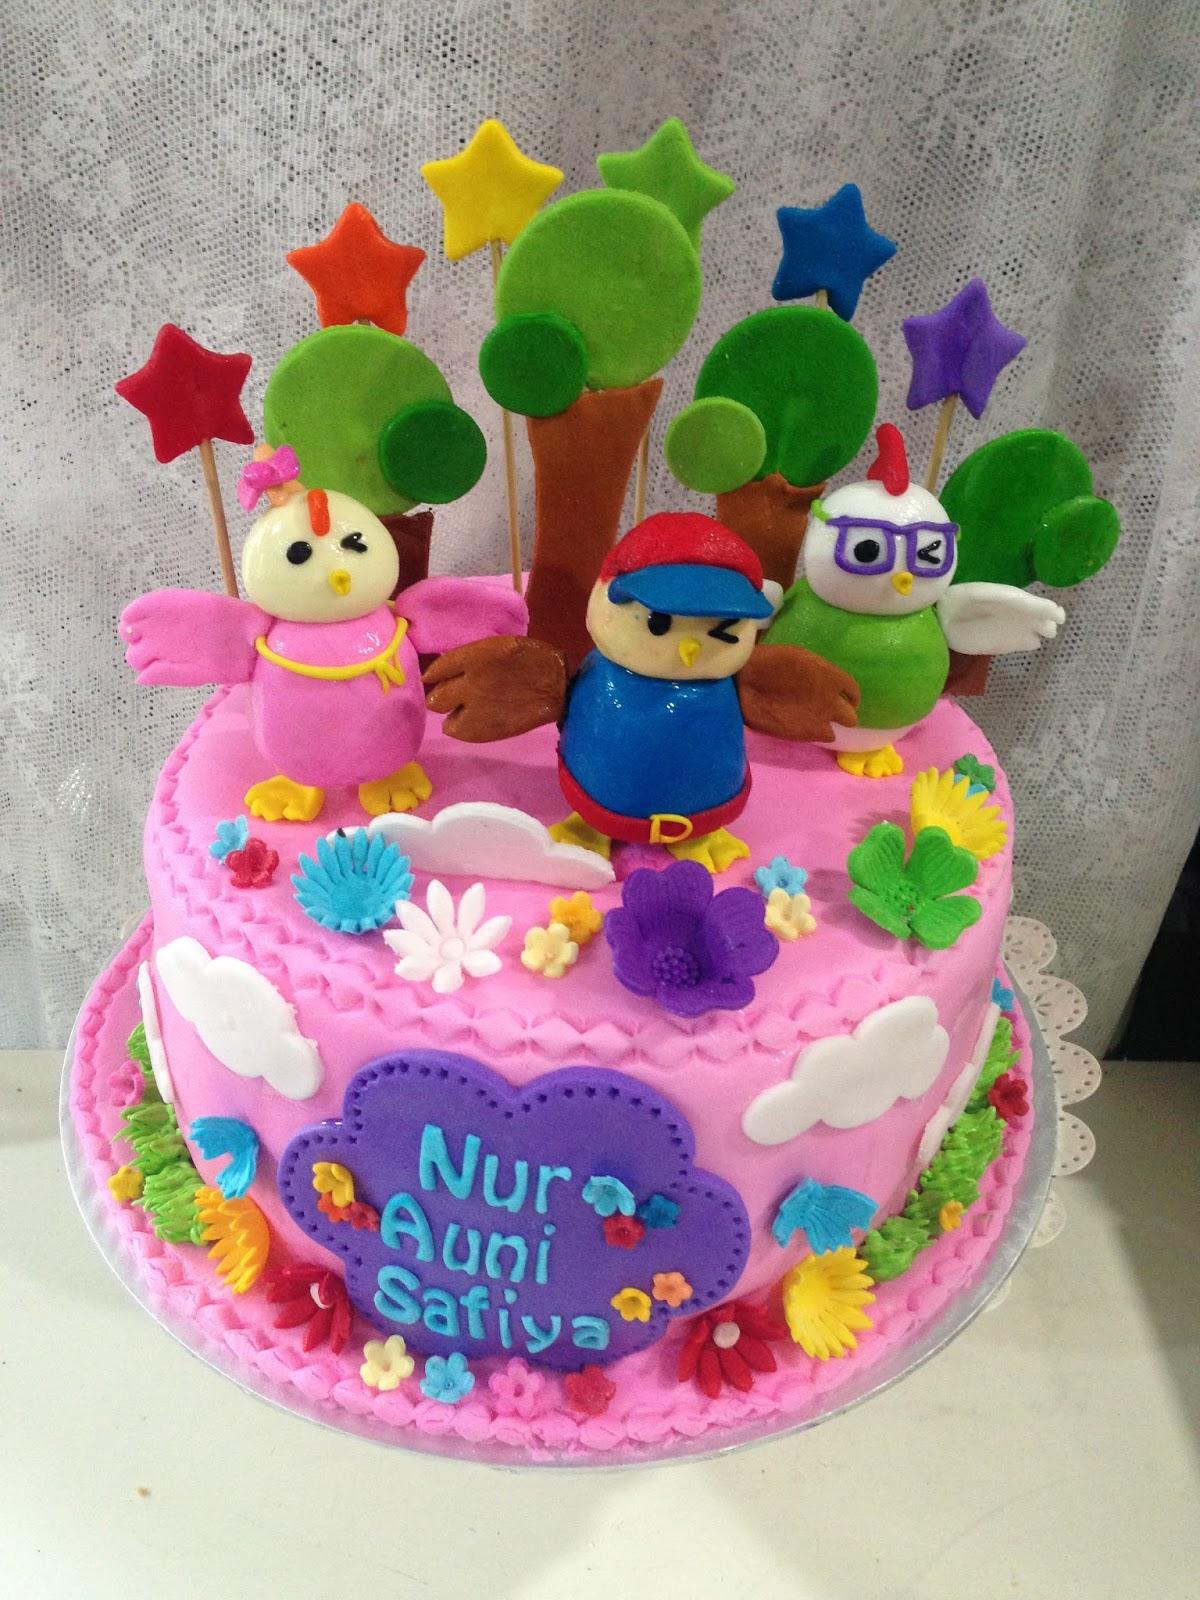 Cake Images For Didi : ninie cakes house: Didi & Friends Fondant Birthday Cake